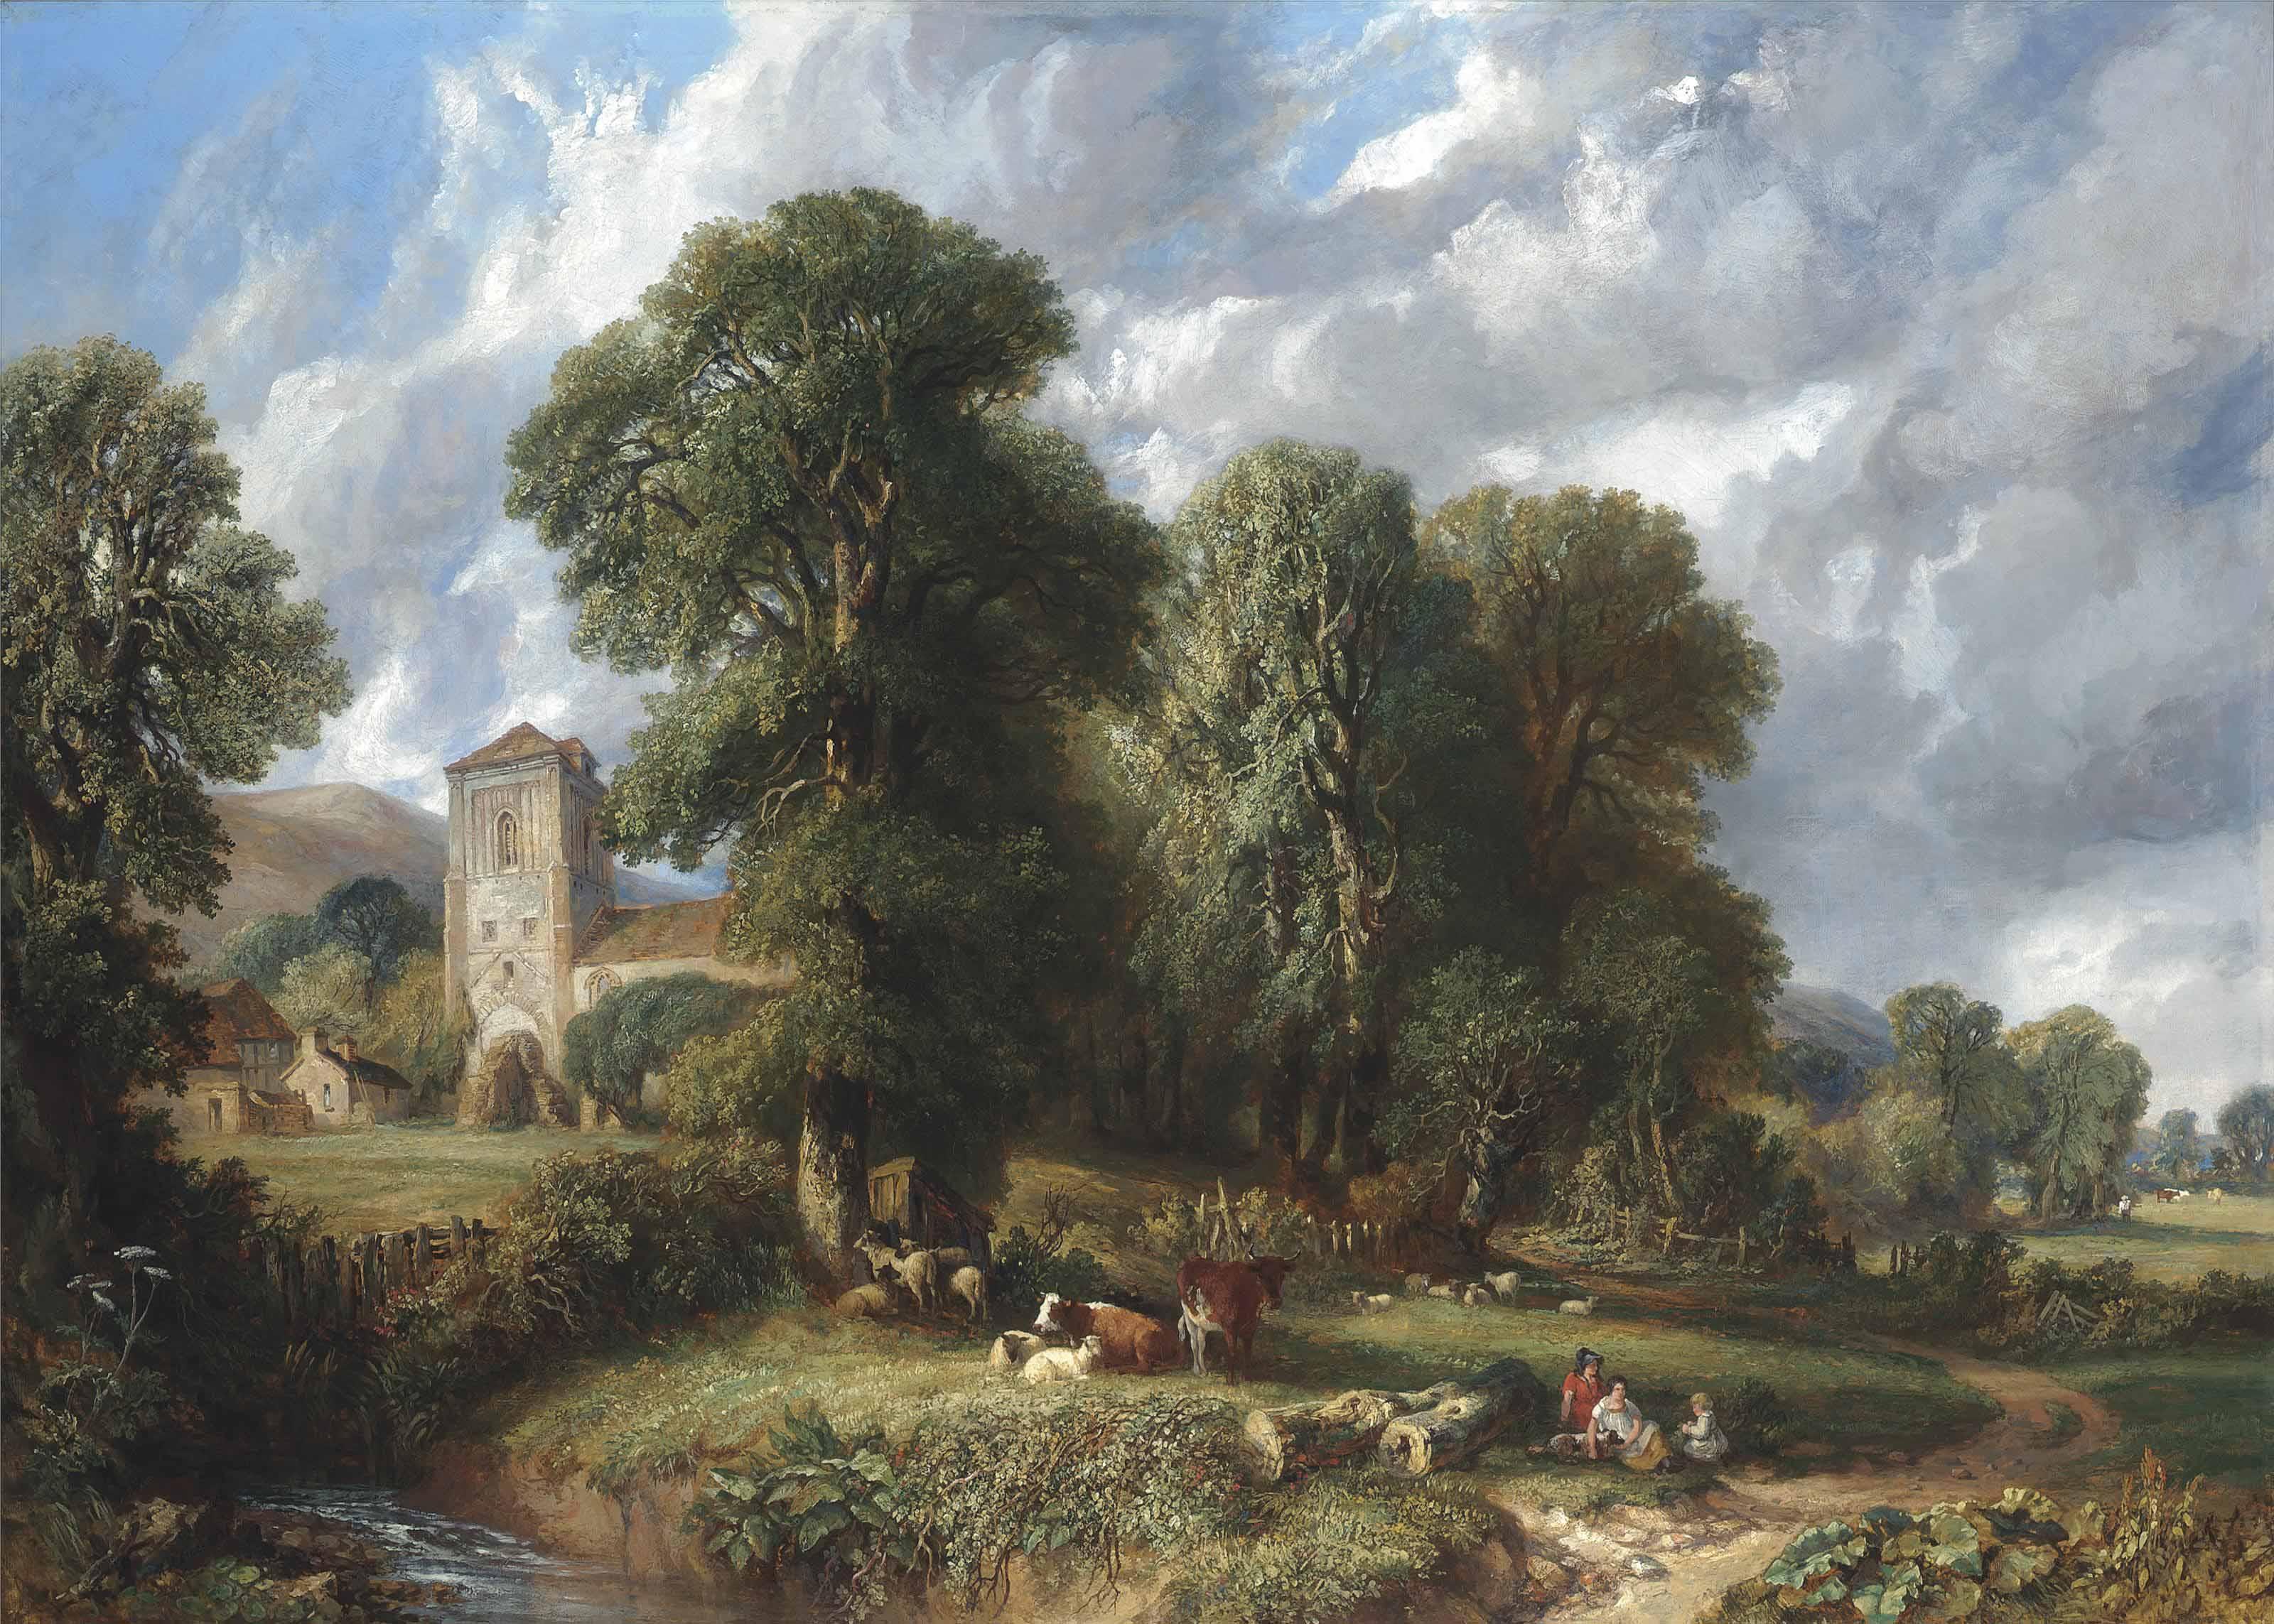 A pastoral idyll